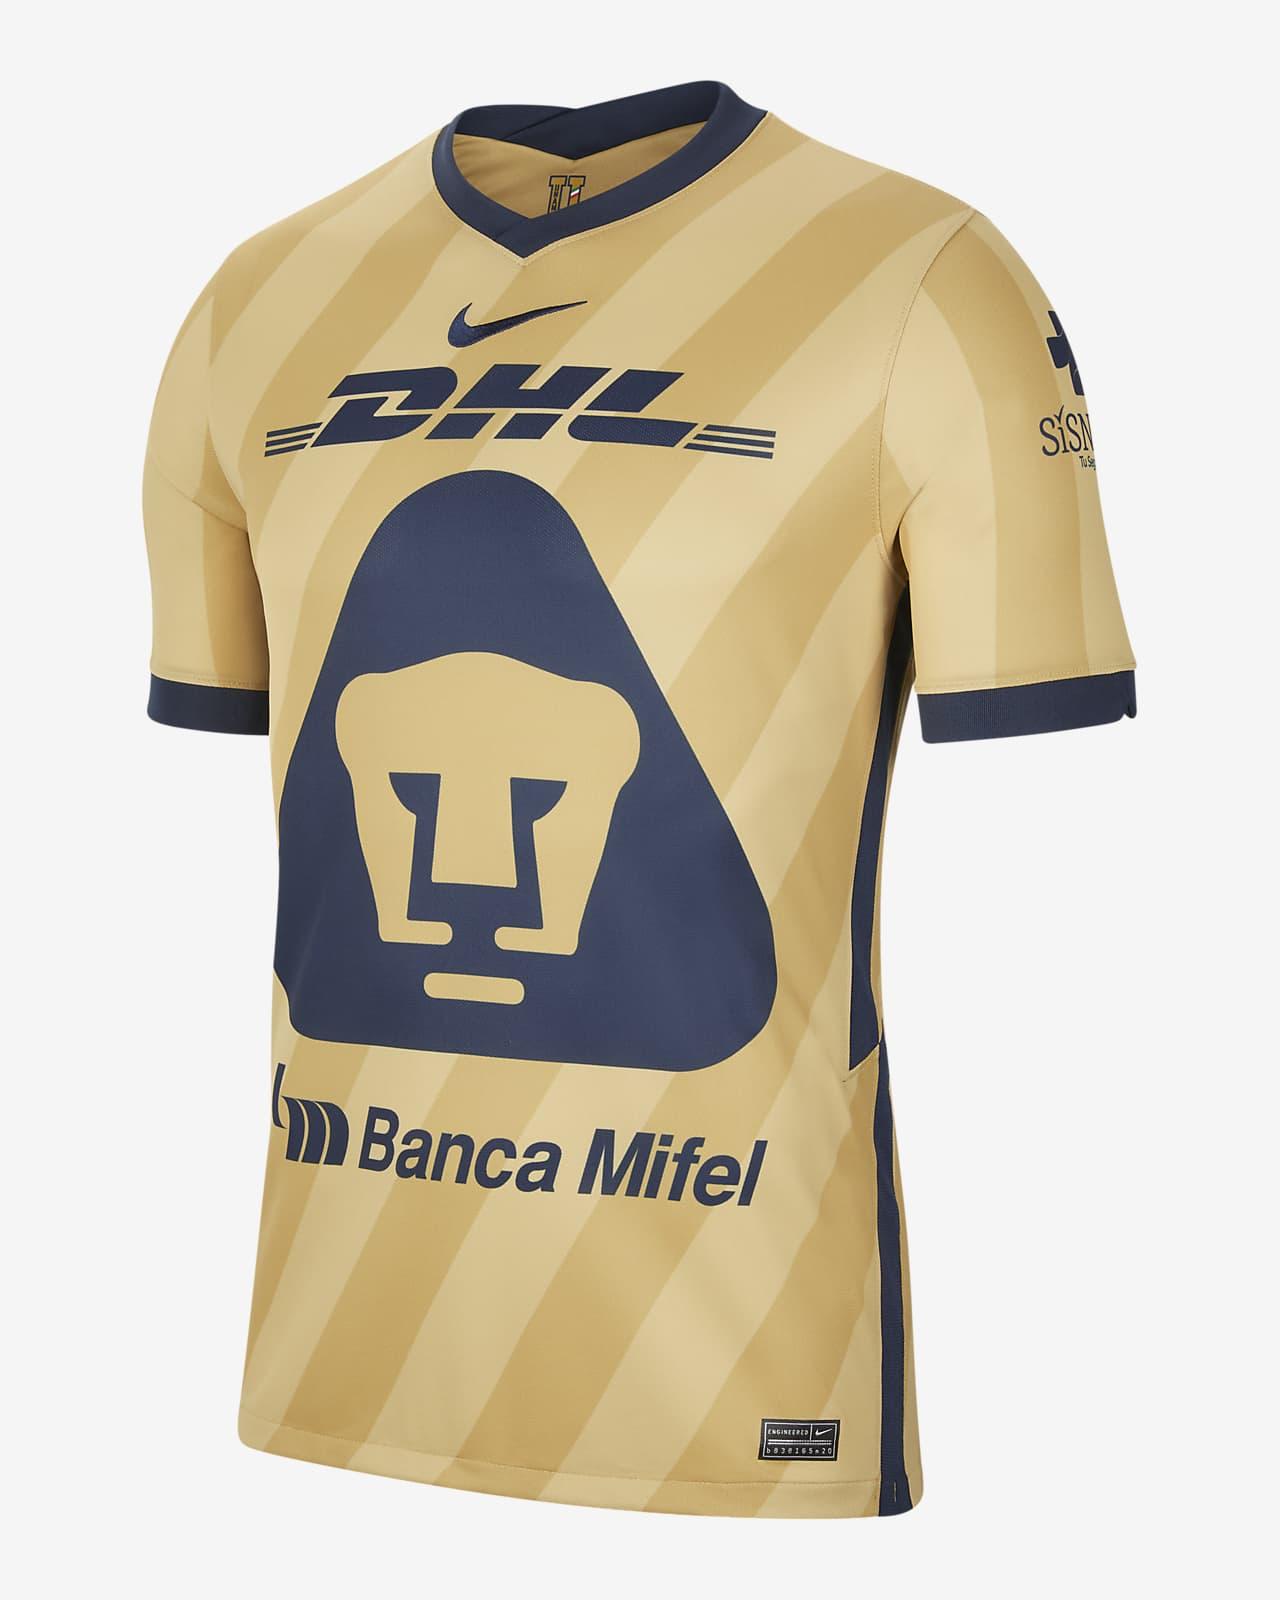 Pumas UNAM 2020/21 Stadium Third Men's Soccer Jersey